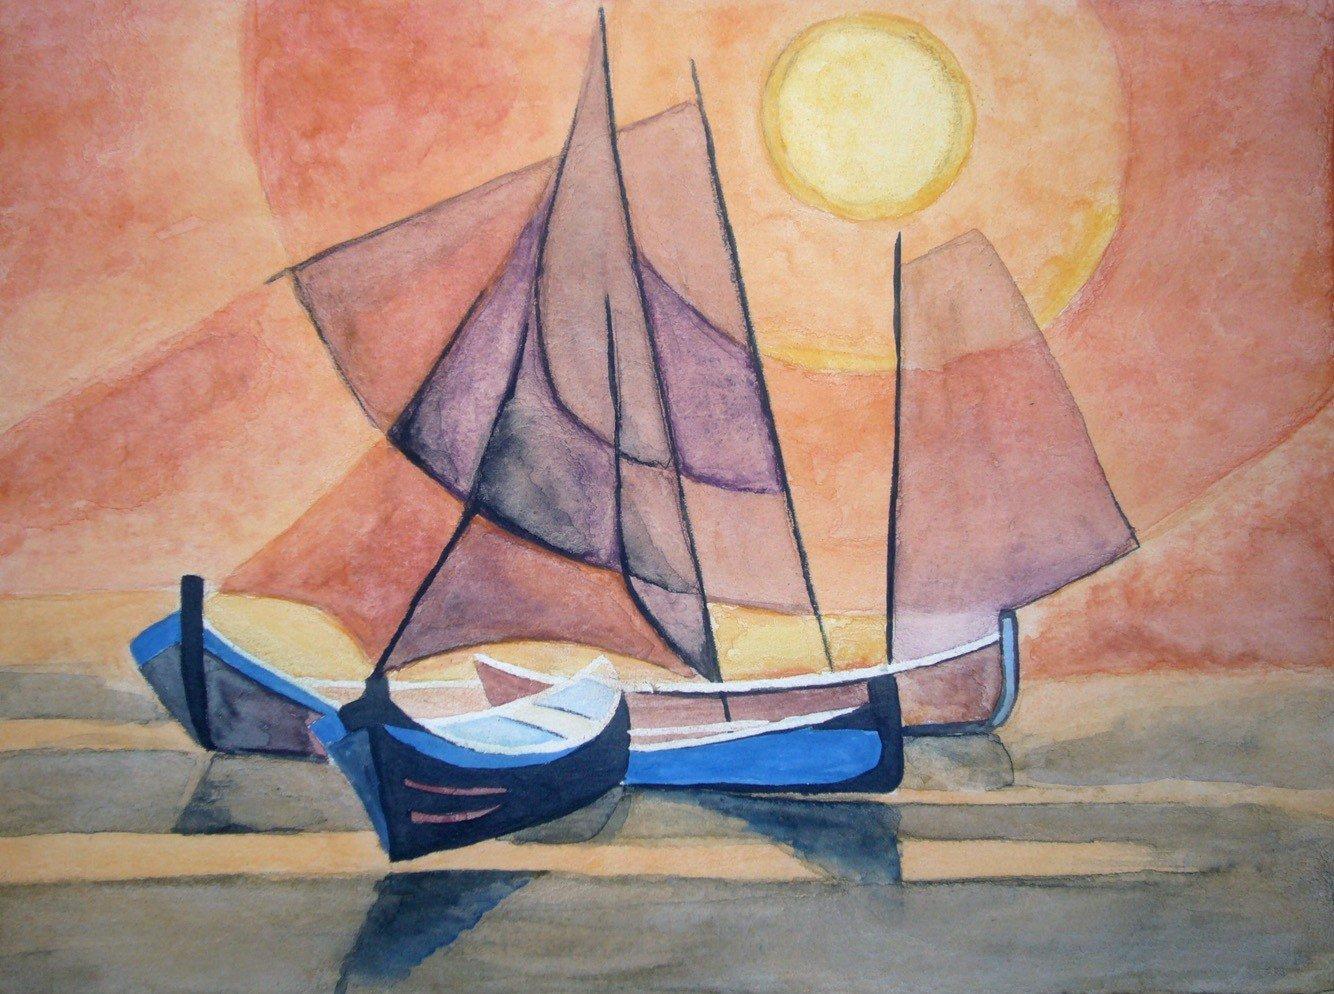 Reproduction de Navires II de Toffoli l'Aquarelle par Alice Gerfault